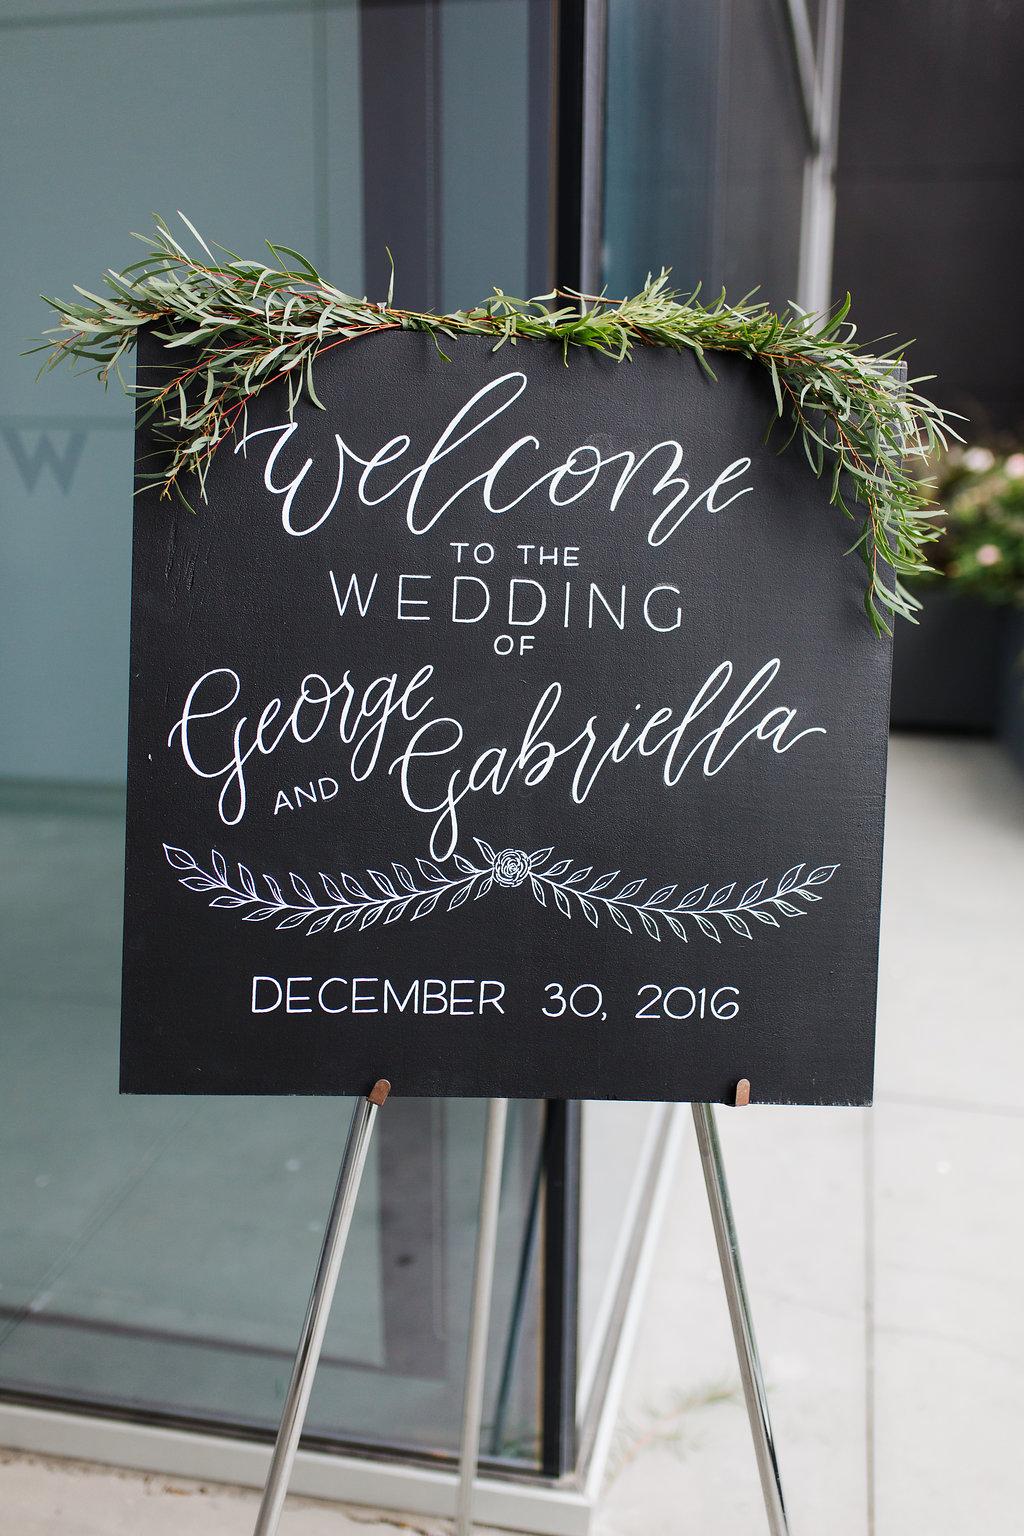 Paige-Newton-Photography-W-Hotel-Wedding-Austin-Photographer0029.jpg